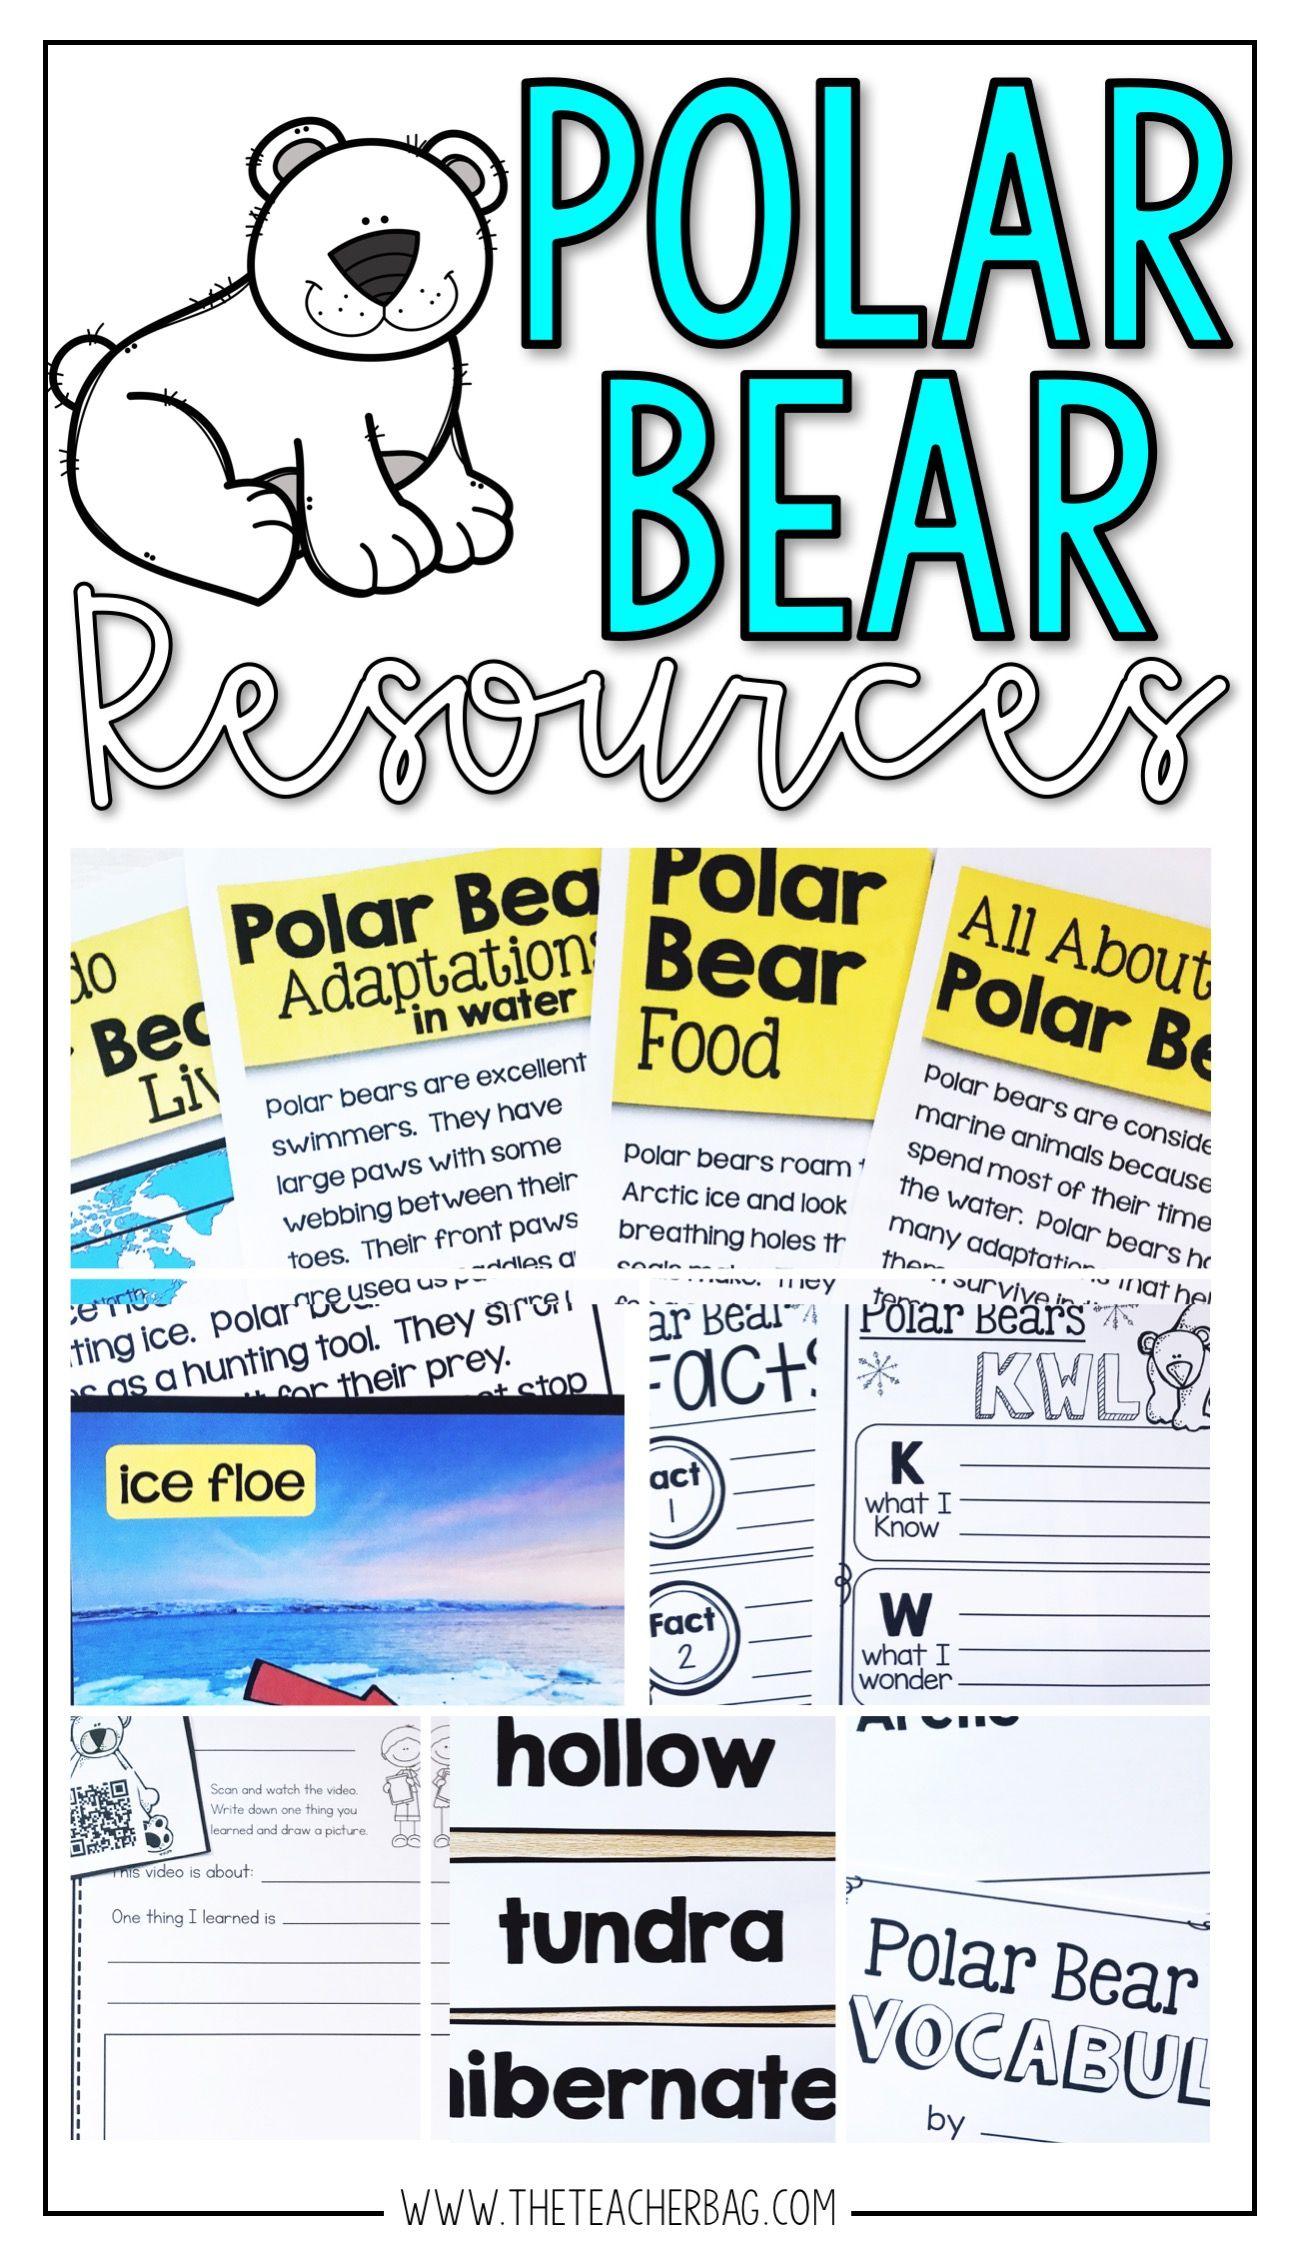 Polar Bear Resources